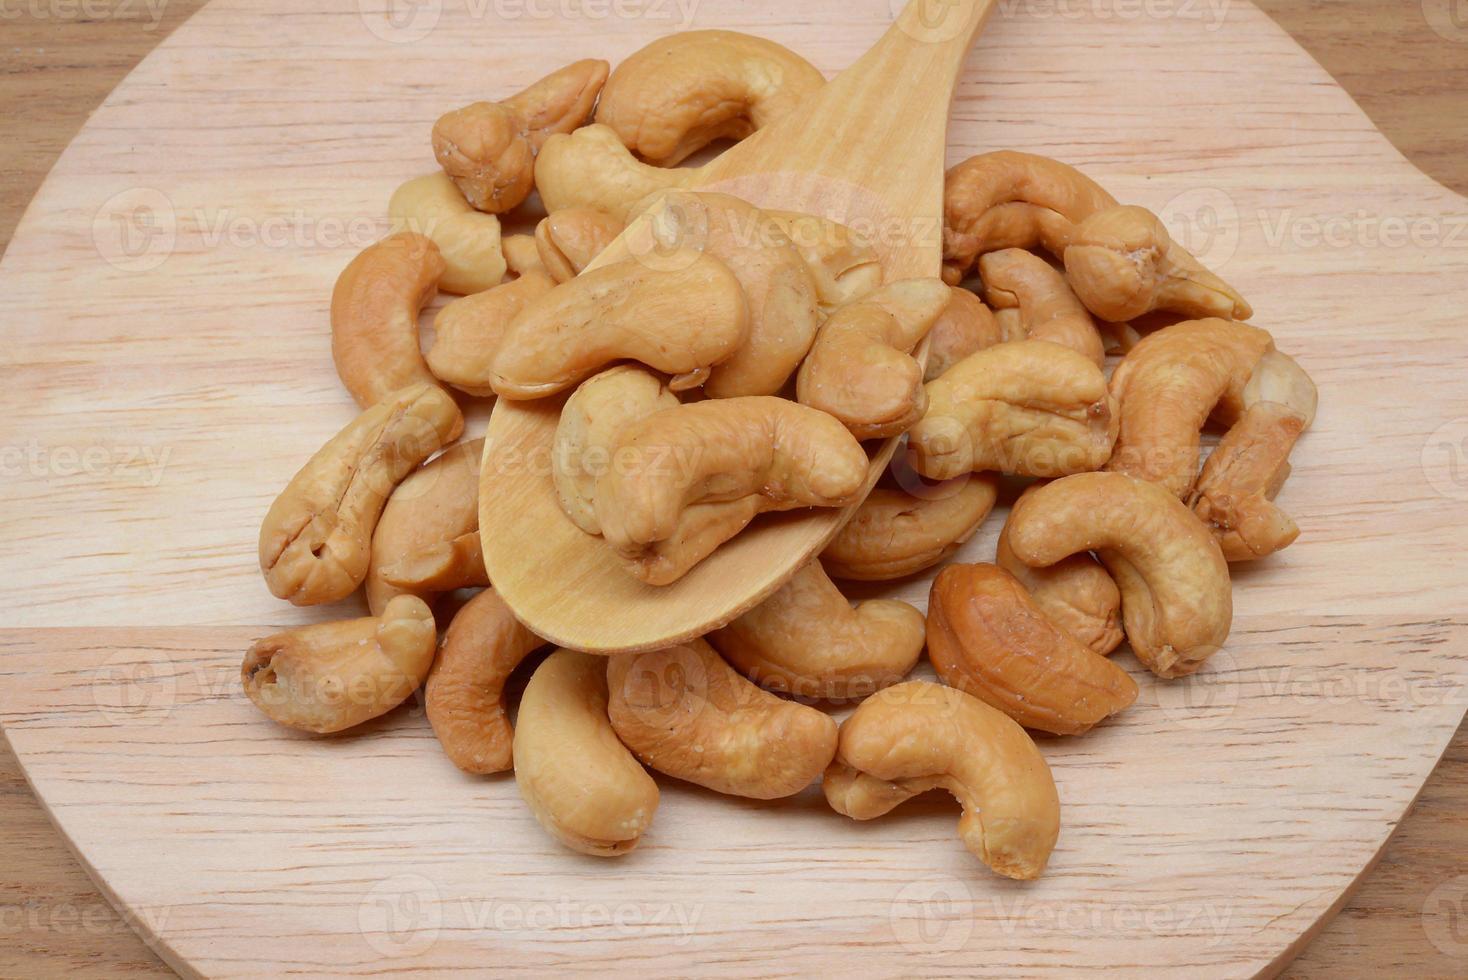 Raw cashews close-up photo